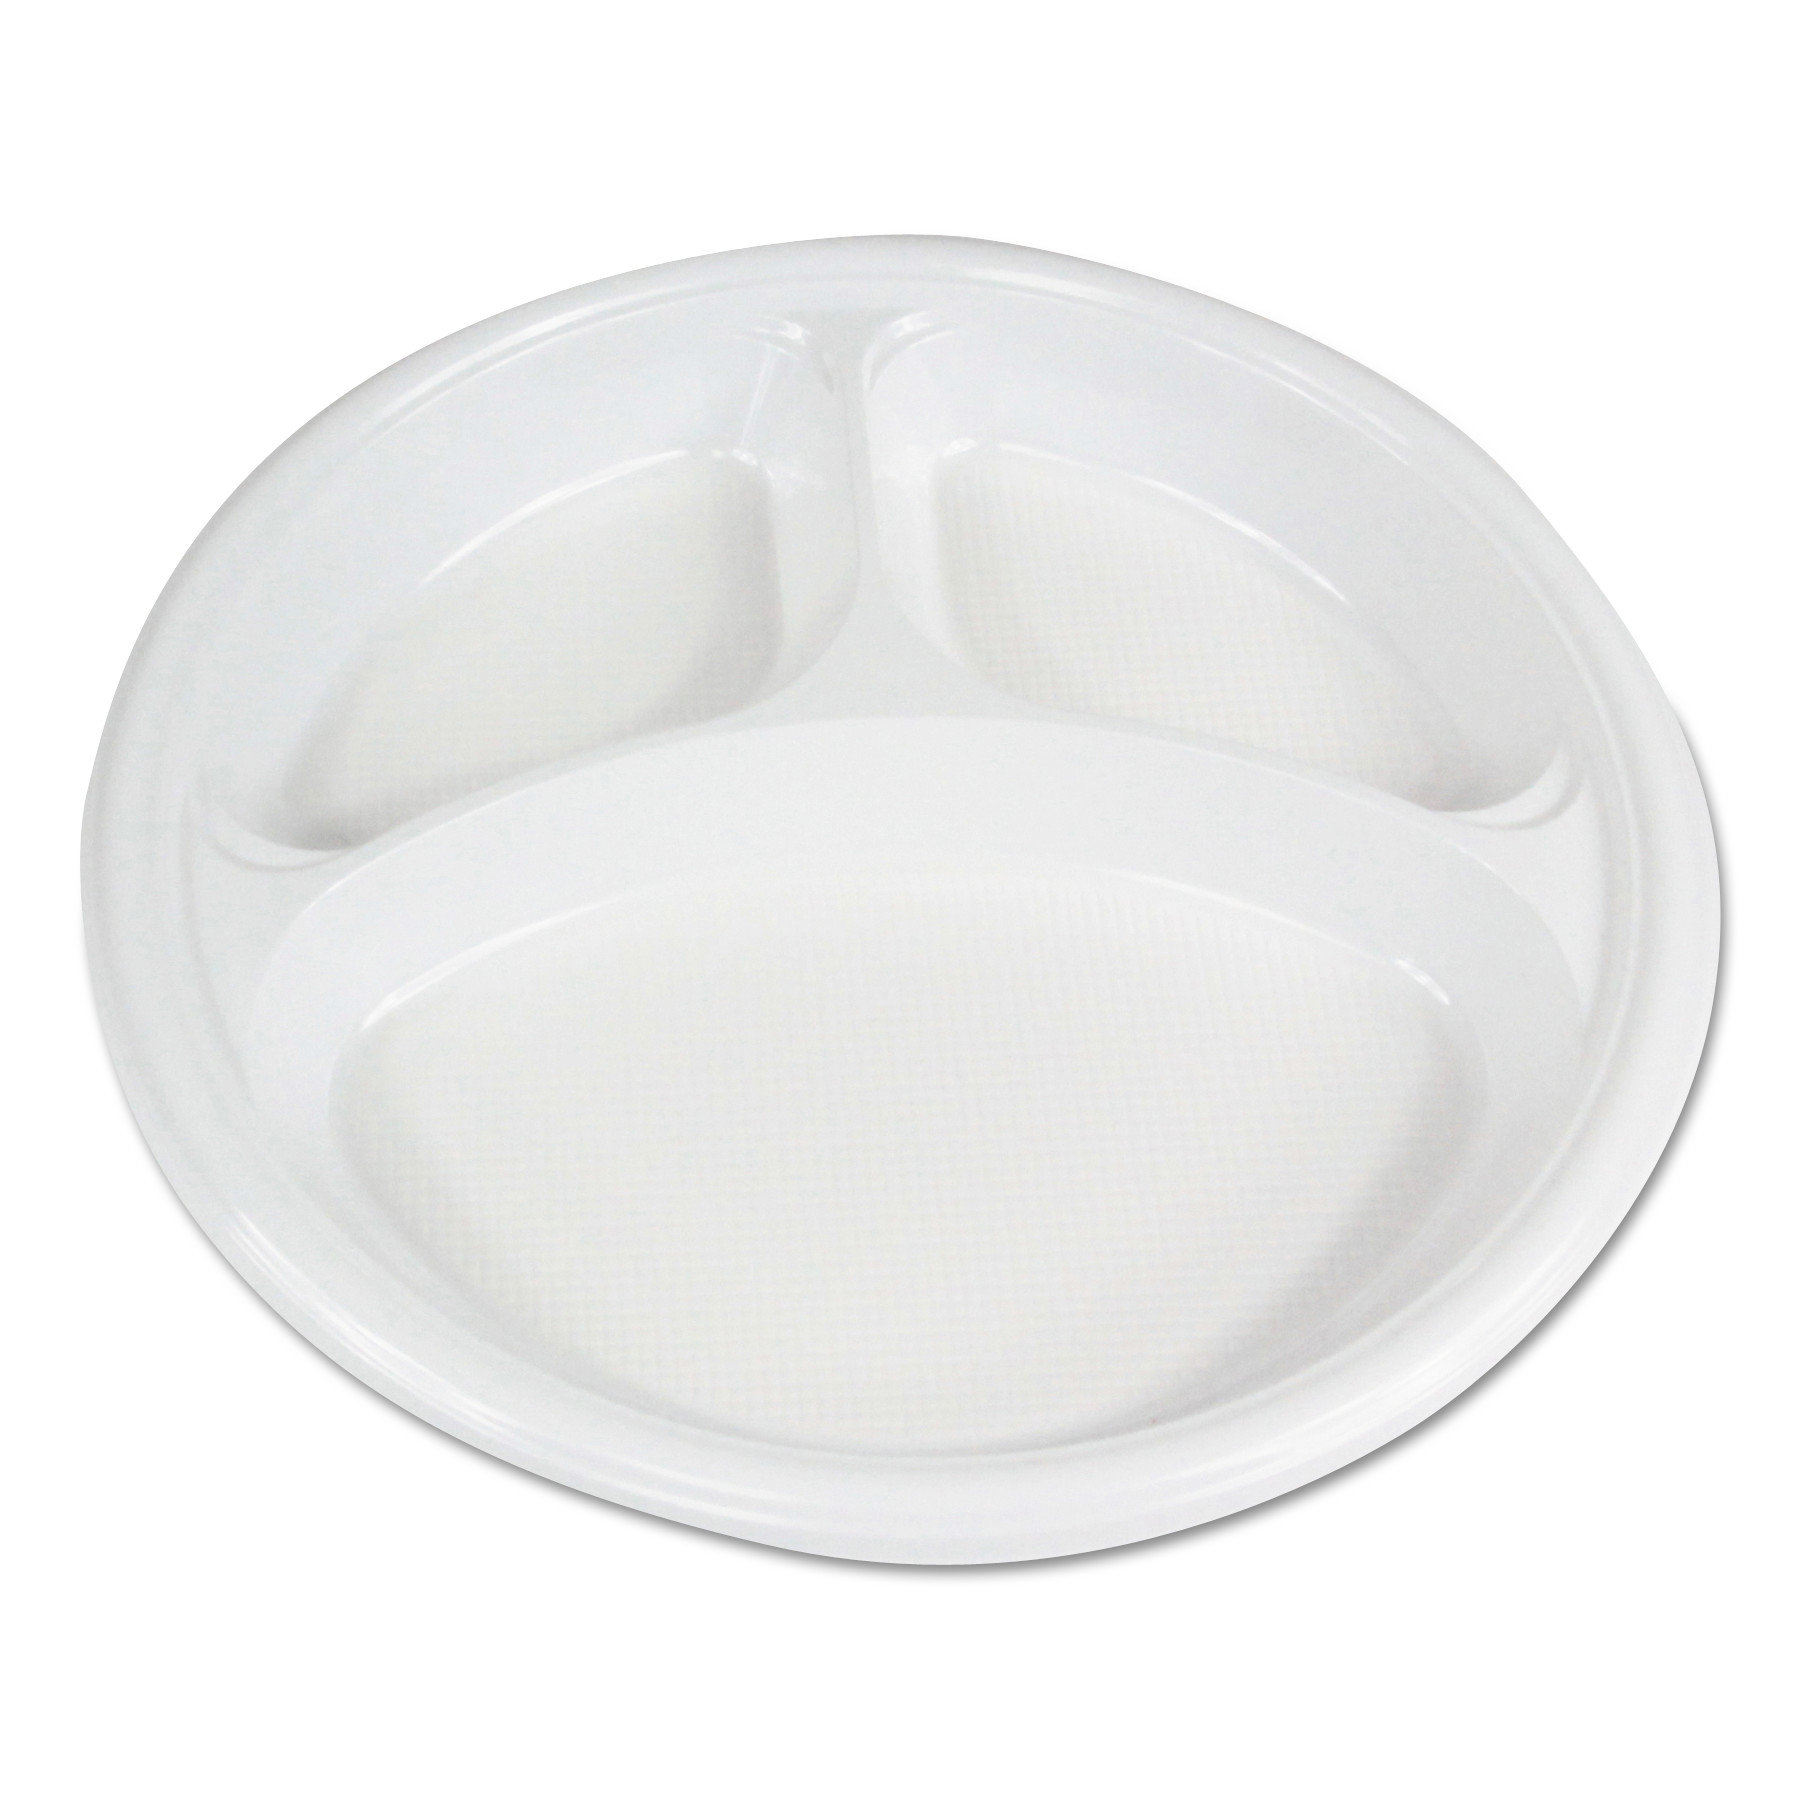 "Hi-Impact Plastic Dinnerware, Plate, 10"" Dia., 3 Compartments, White, 500/Carton"